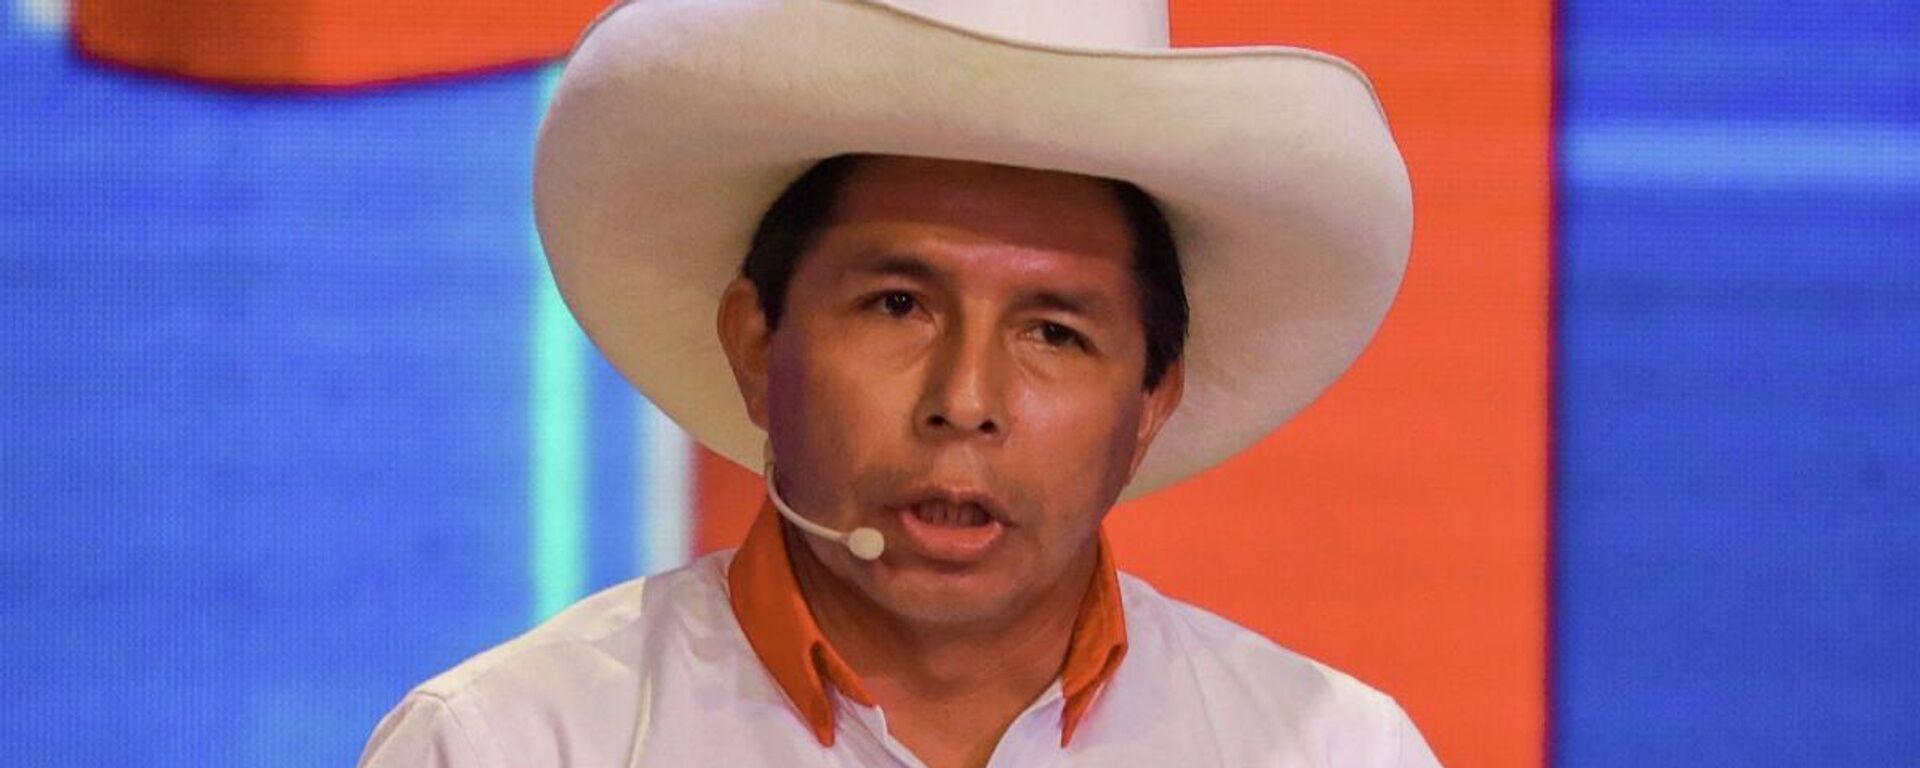 Pedro Castillo, político peruano - Sputnik Mundo, 1920, 11.05.2021